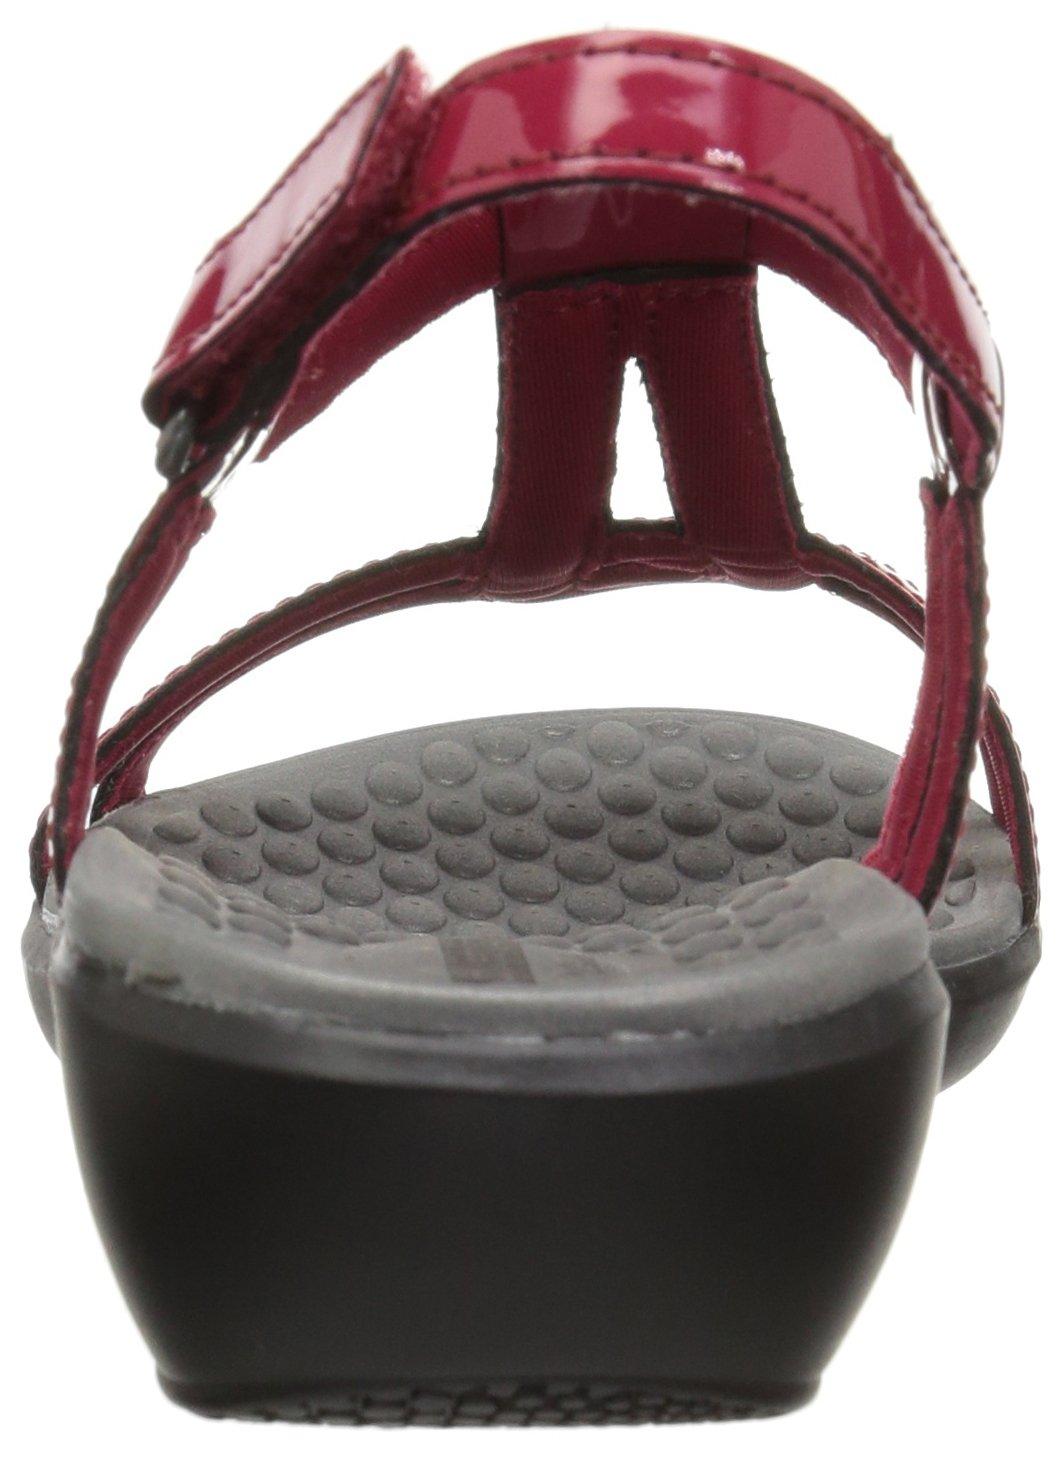 Clarks Women's Tri Ariana Toe Loop Sandal Black Combi Leather 15632 Sz 10 M for sale online   eBay